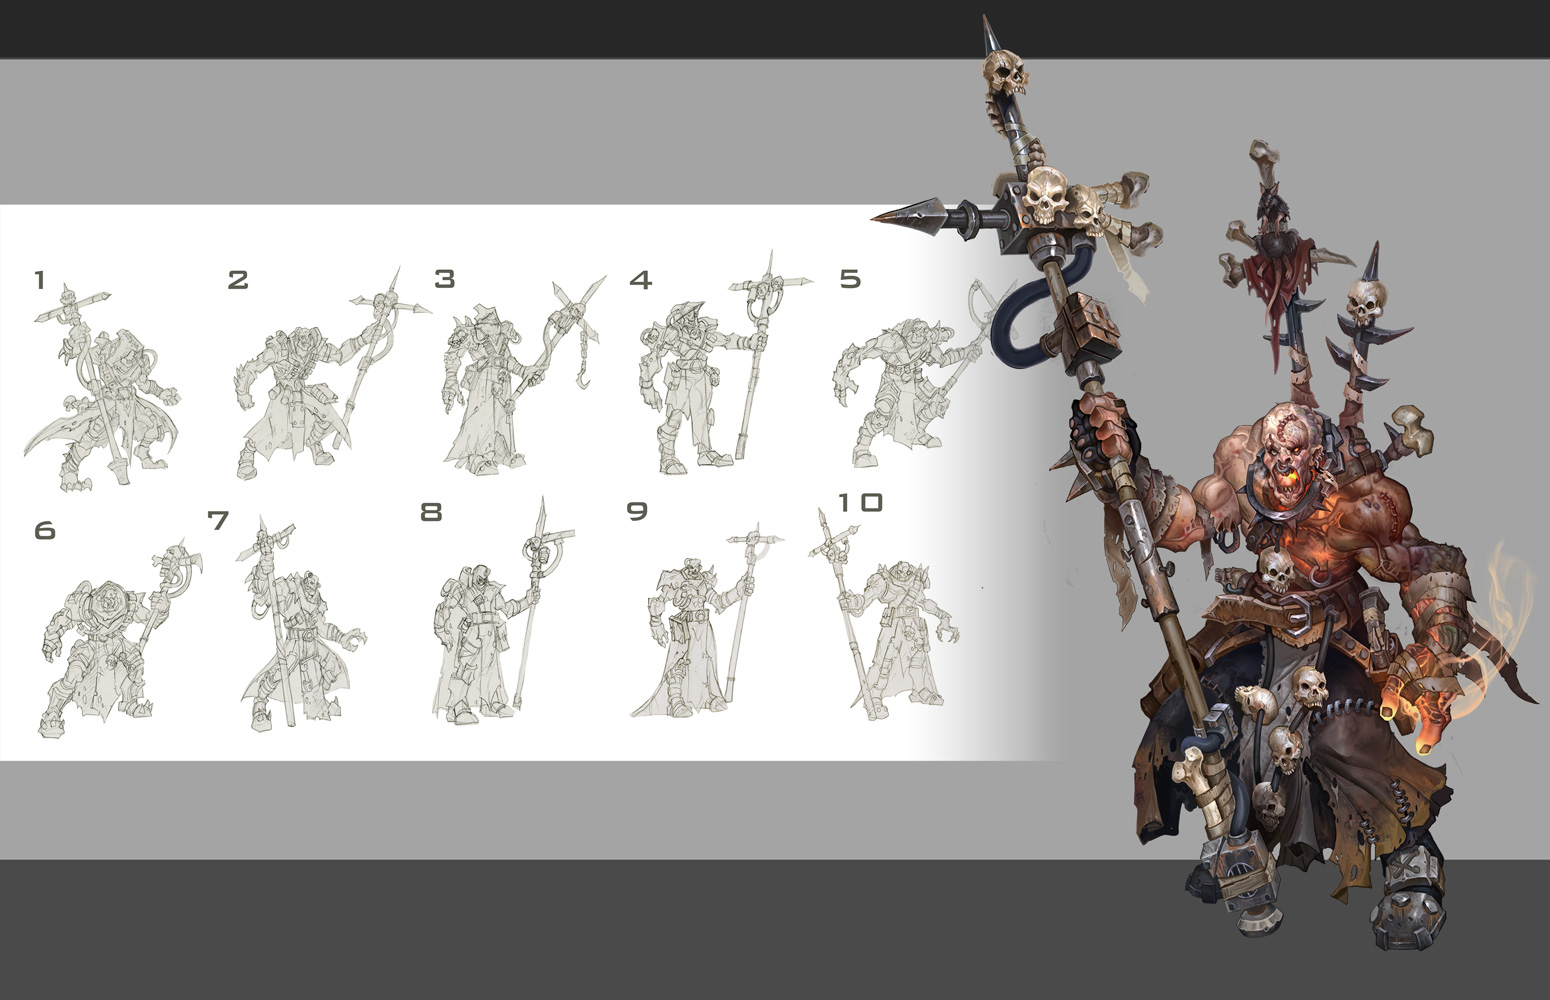 [E3] Eternal Crusade, un MMO Warhammer 40K - Page 3 10